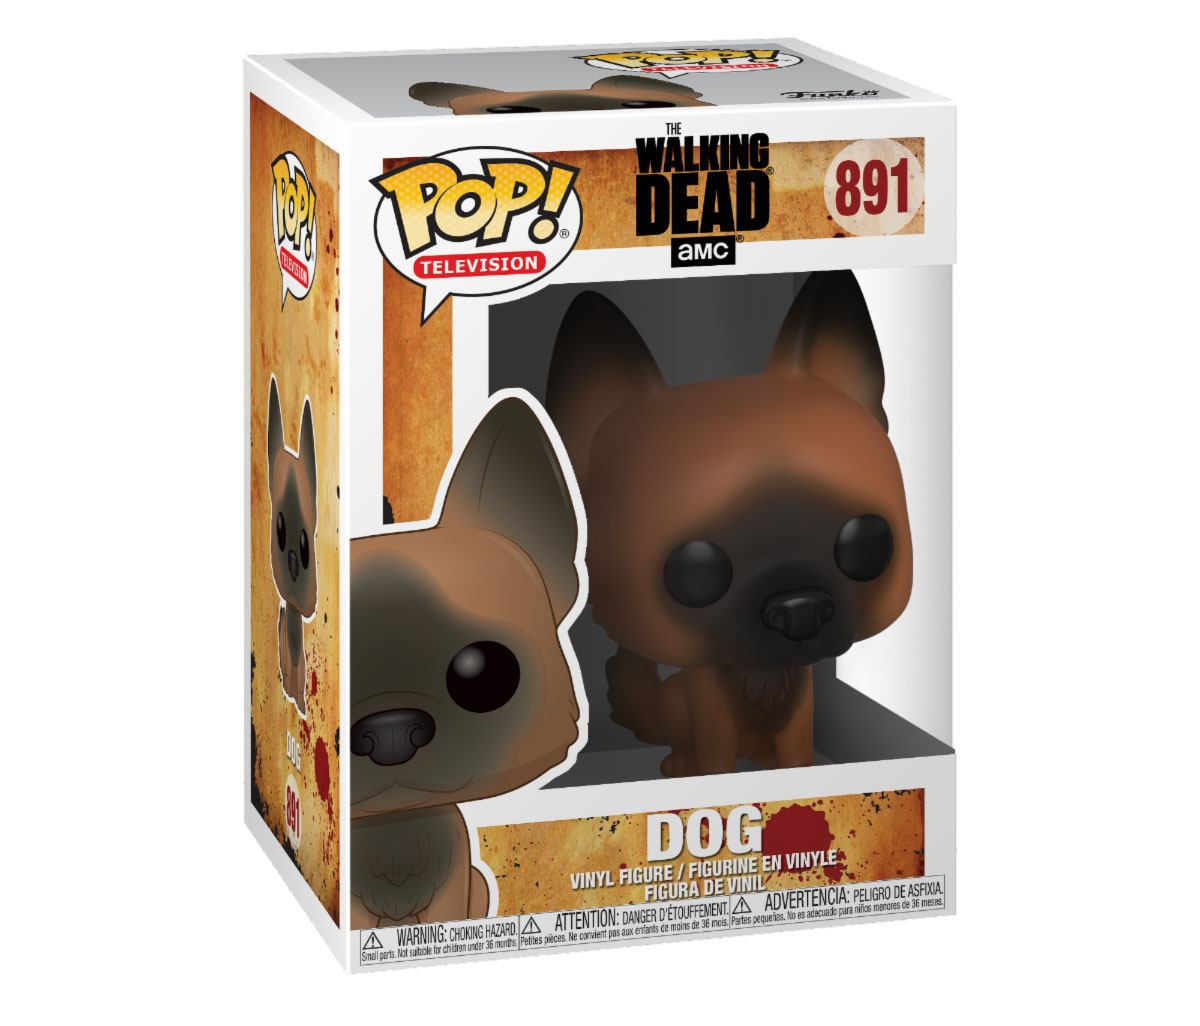 Walking Dead POP! Television Vinyl Figure Dog 10 cm